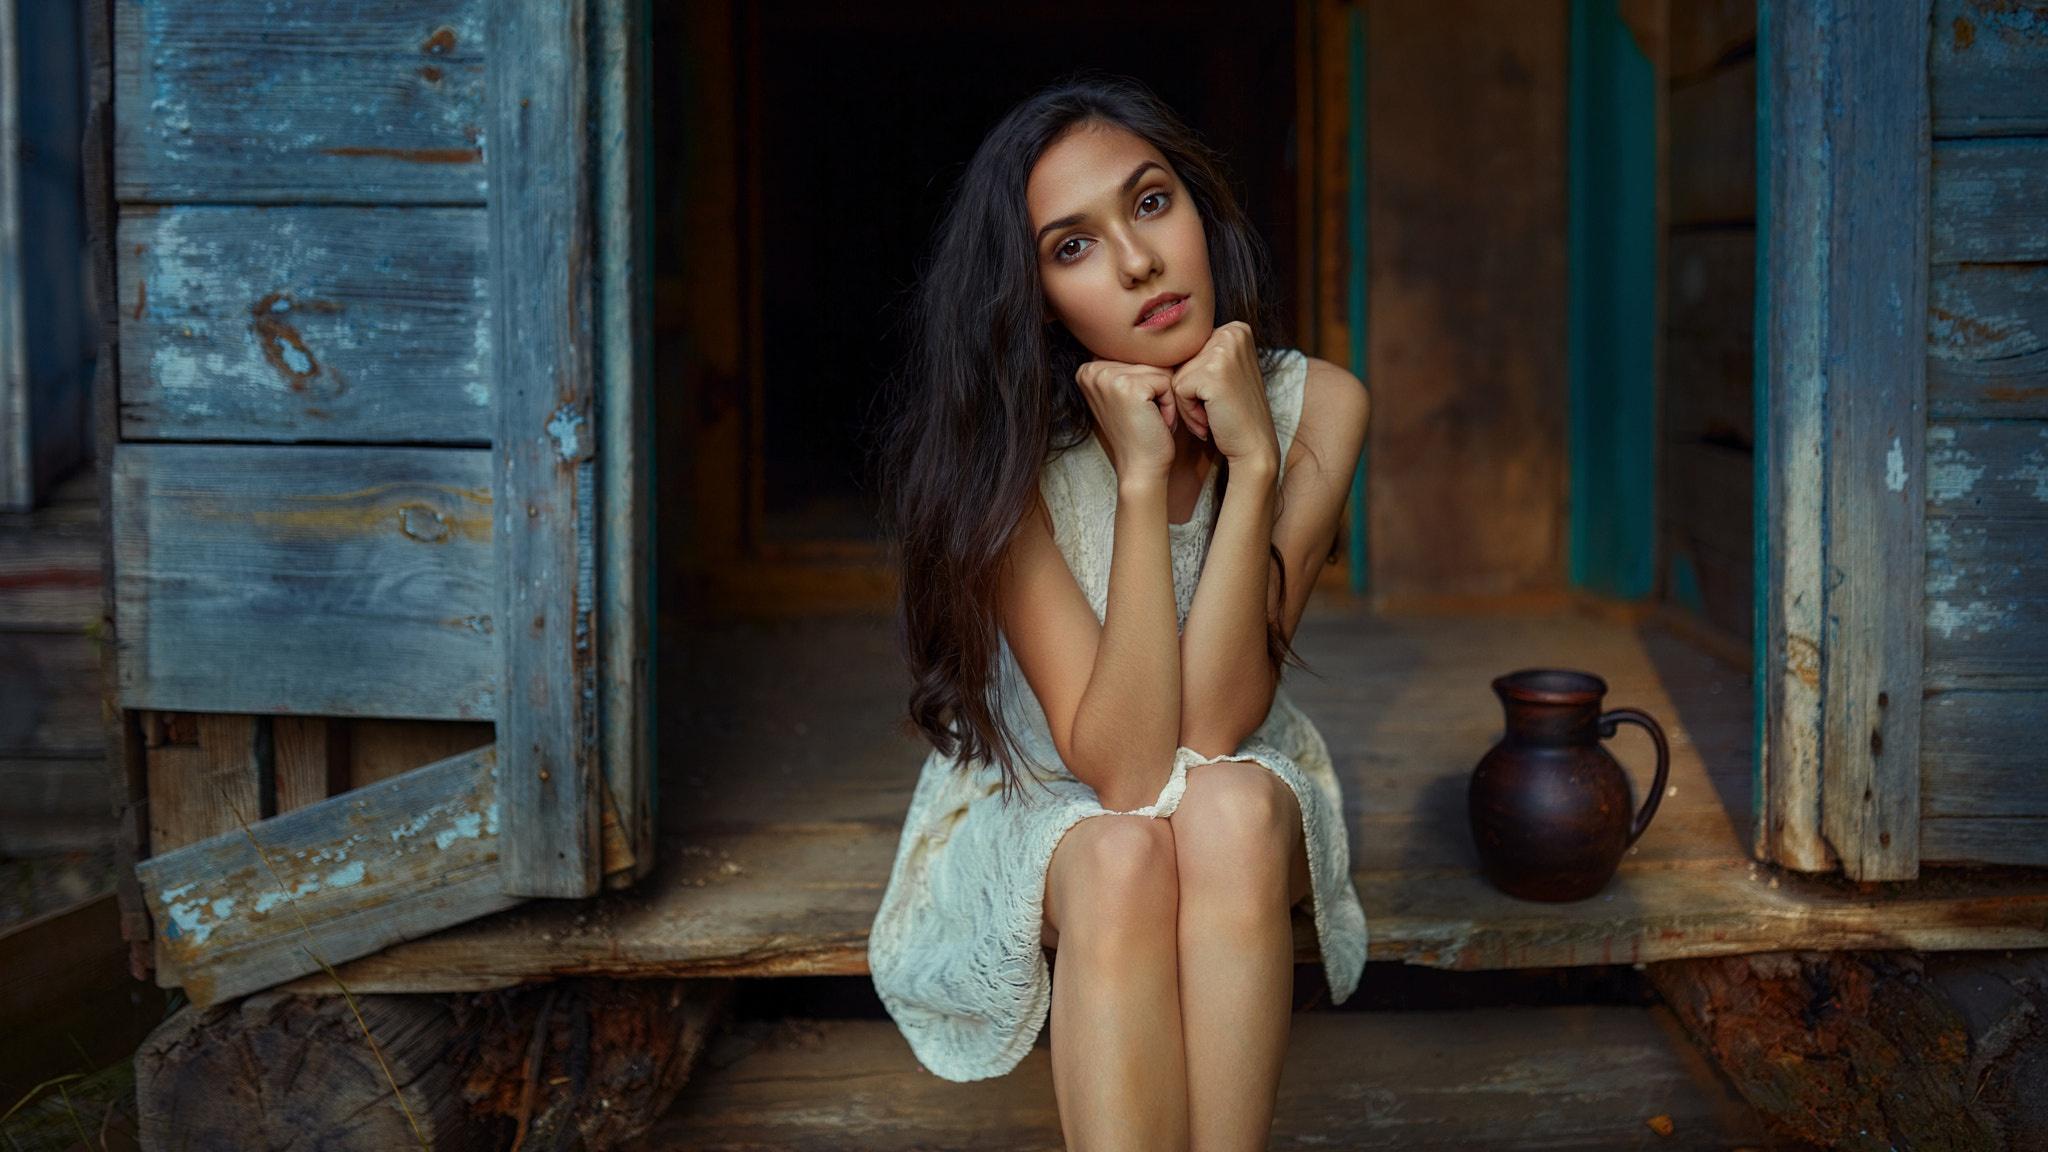 Andrey Metelkov Model Women Brunette Brown Eyes Dress Bare Shoulders Legs Sitting Touching Face Long 2048x1152